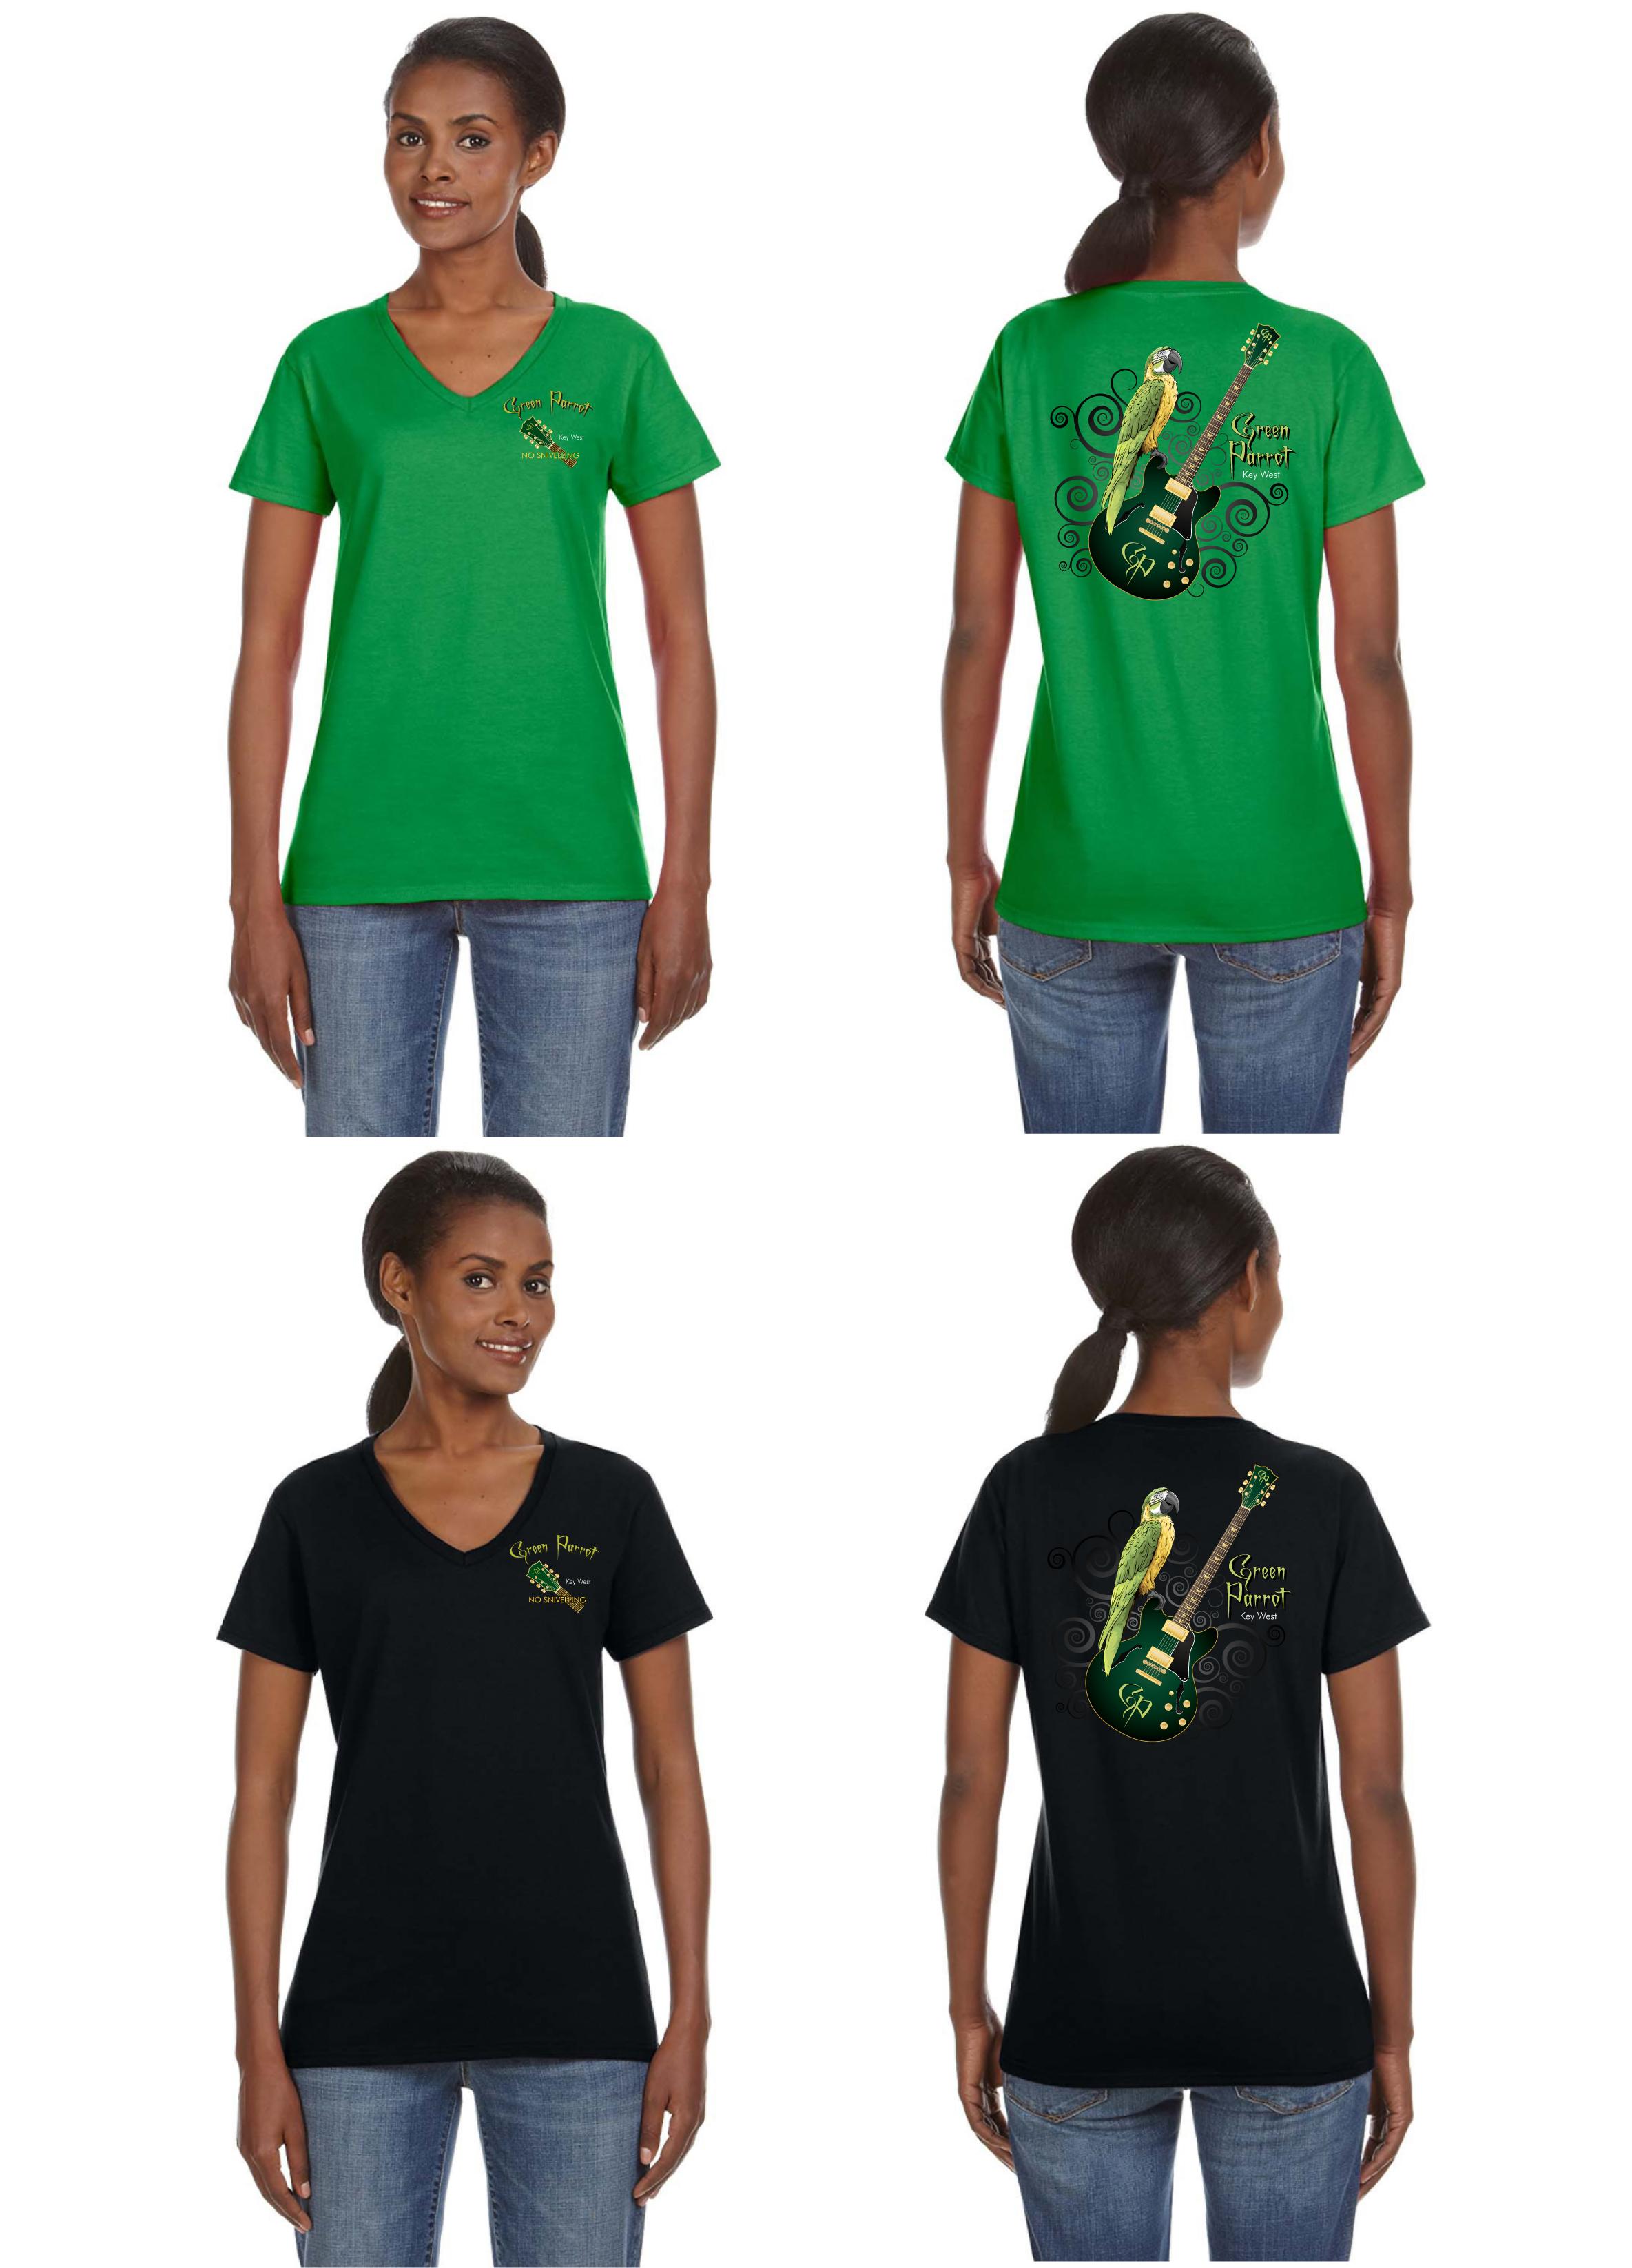 88vl_black and green ladies v neck proofs.jpg